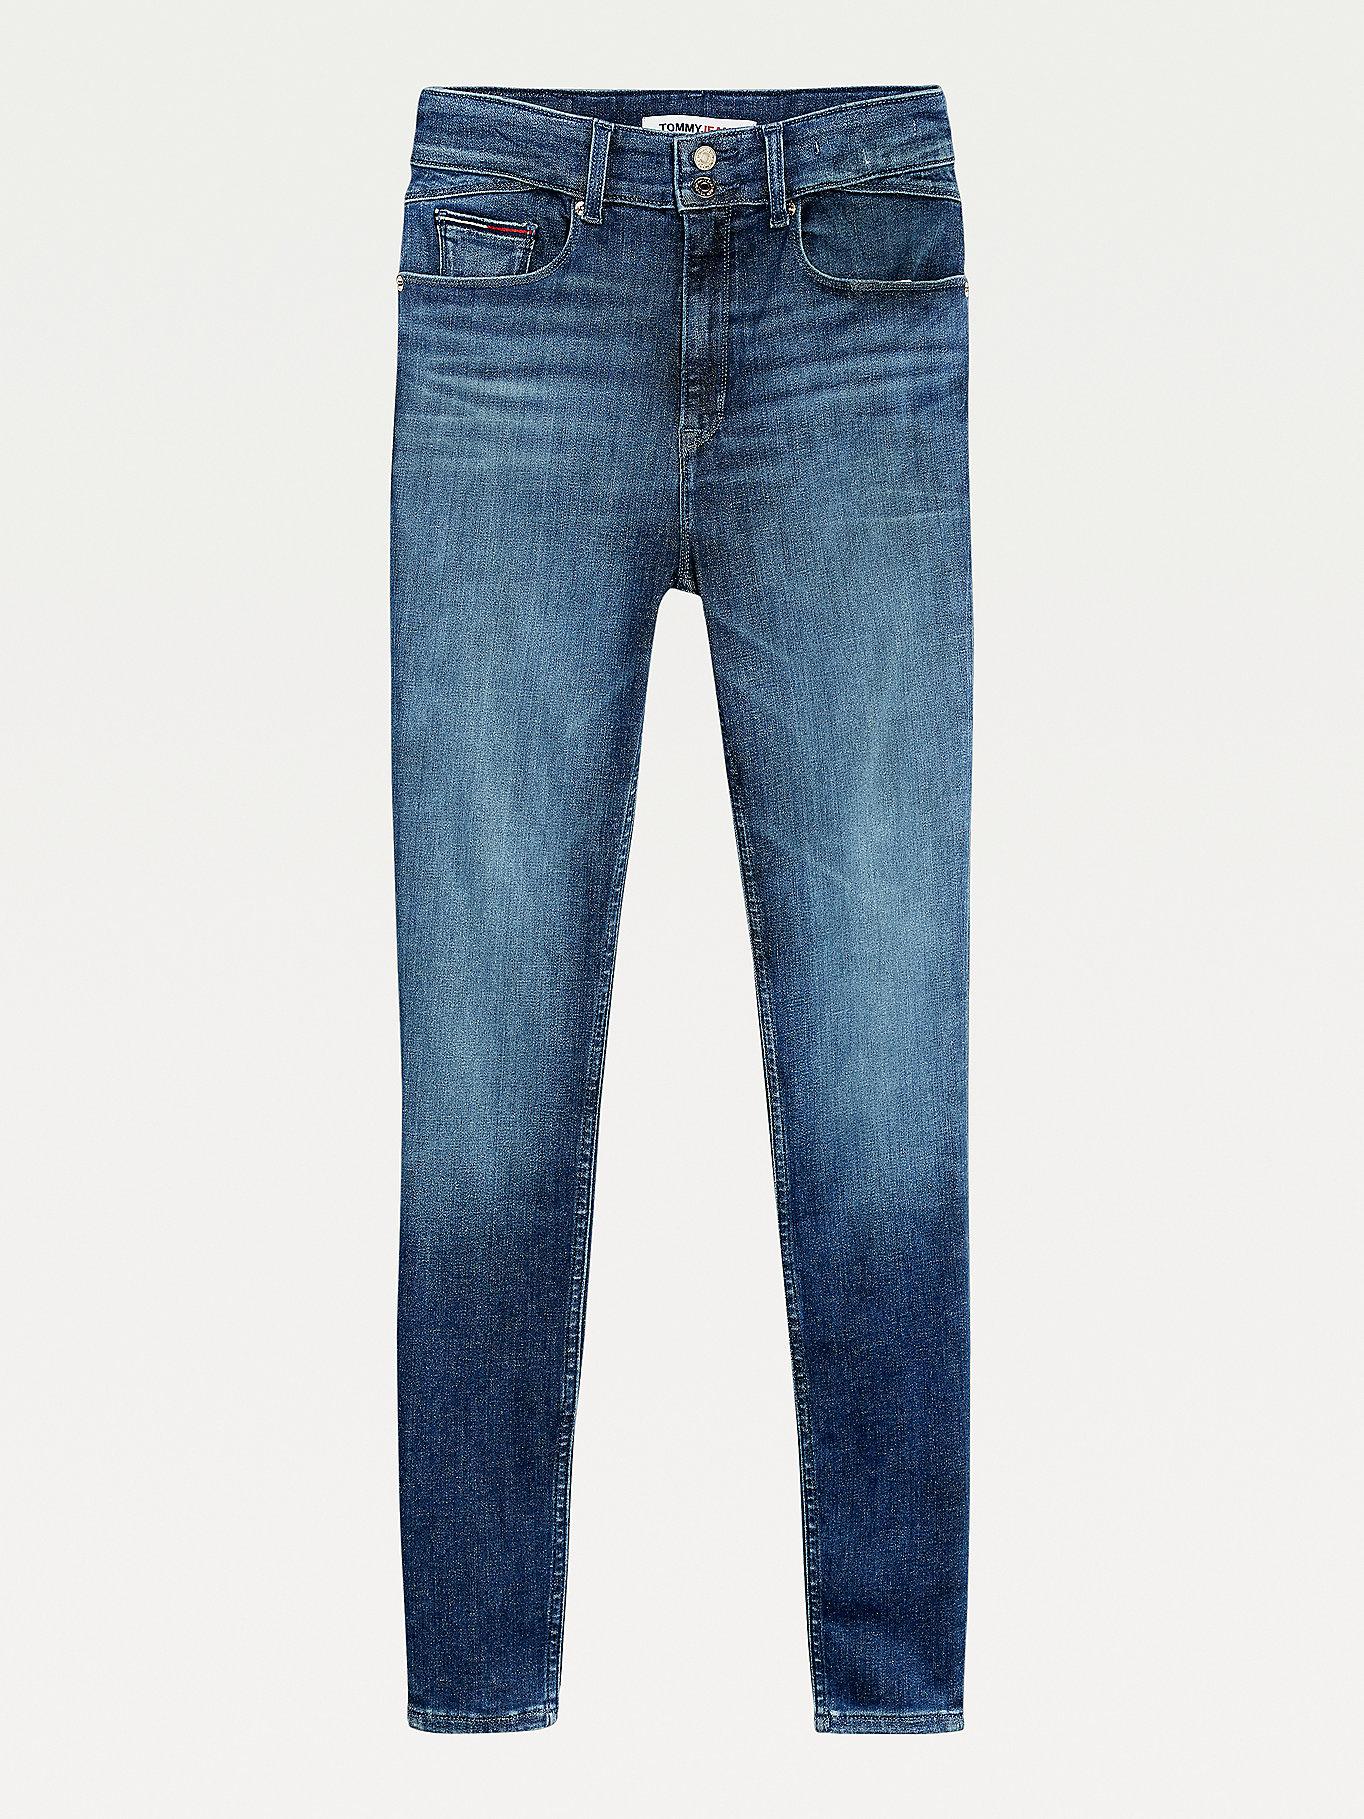 Shape Skinny Jeans mit hohem Bund